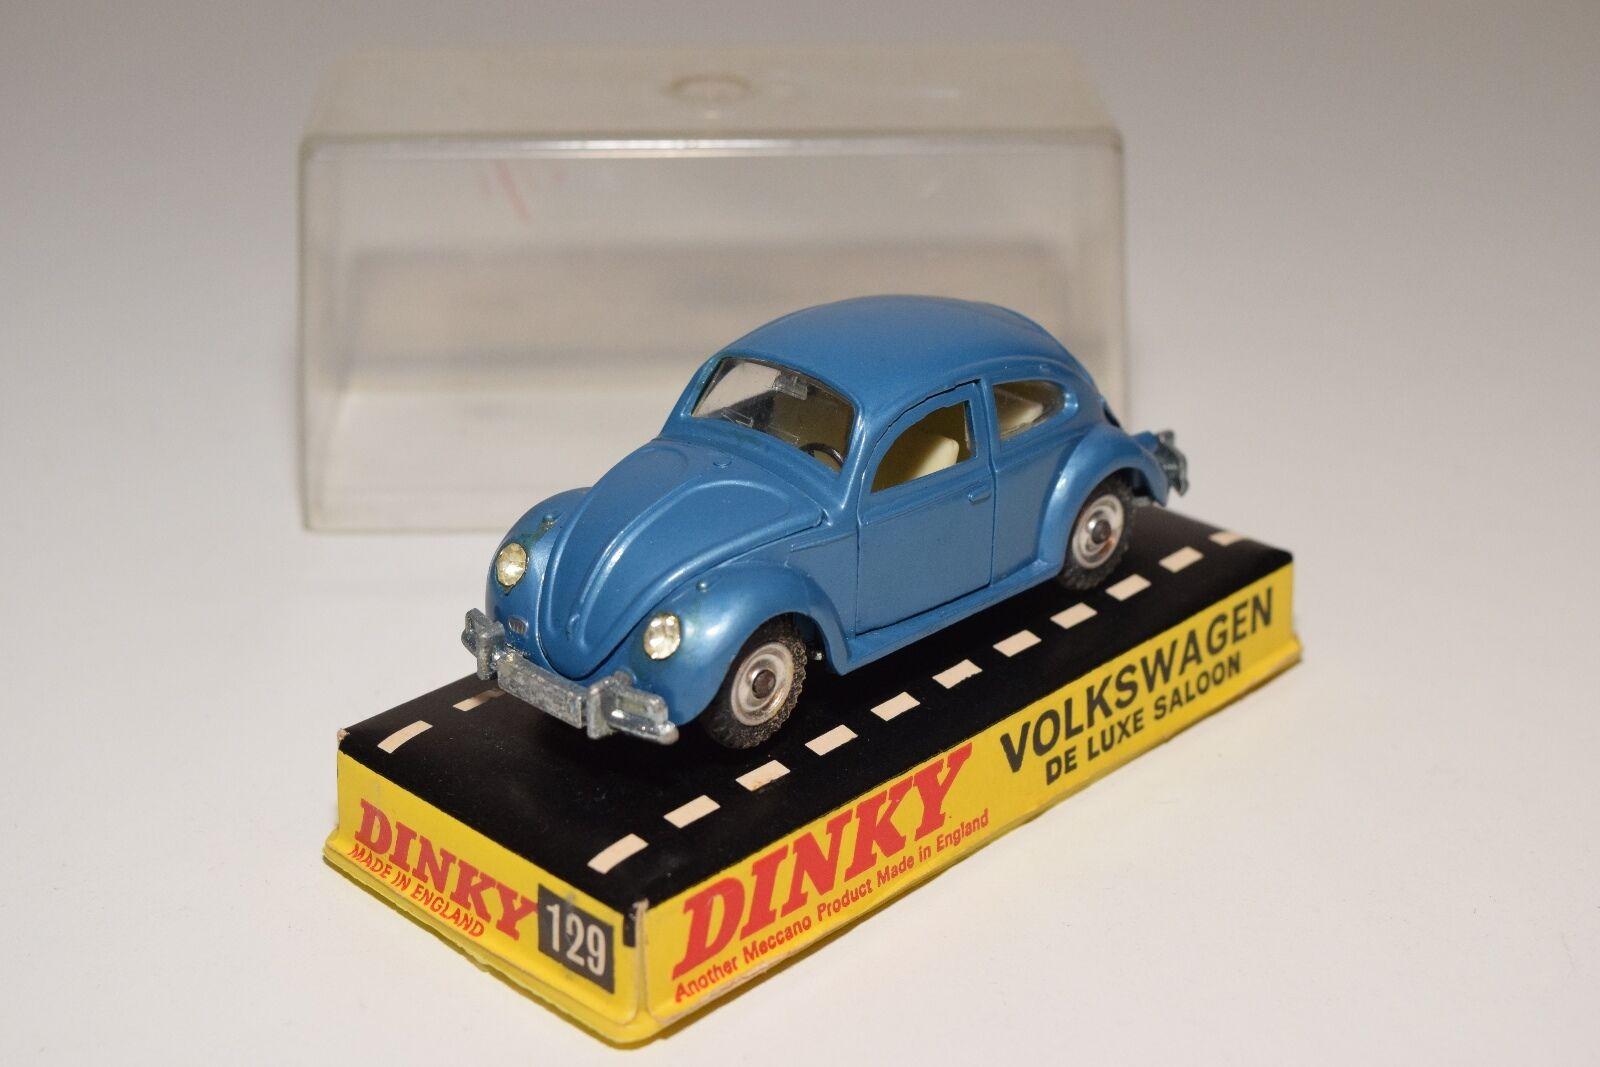 \\ DINKY TOYS 129 VW VOLKSWAGEN DE LUXE SALOON BEETLE KAFER bleu MINT BOXED